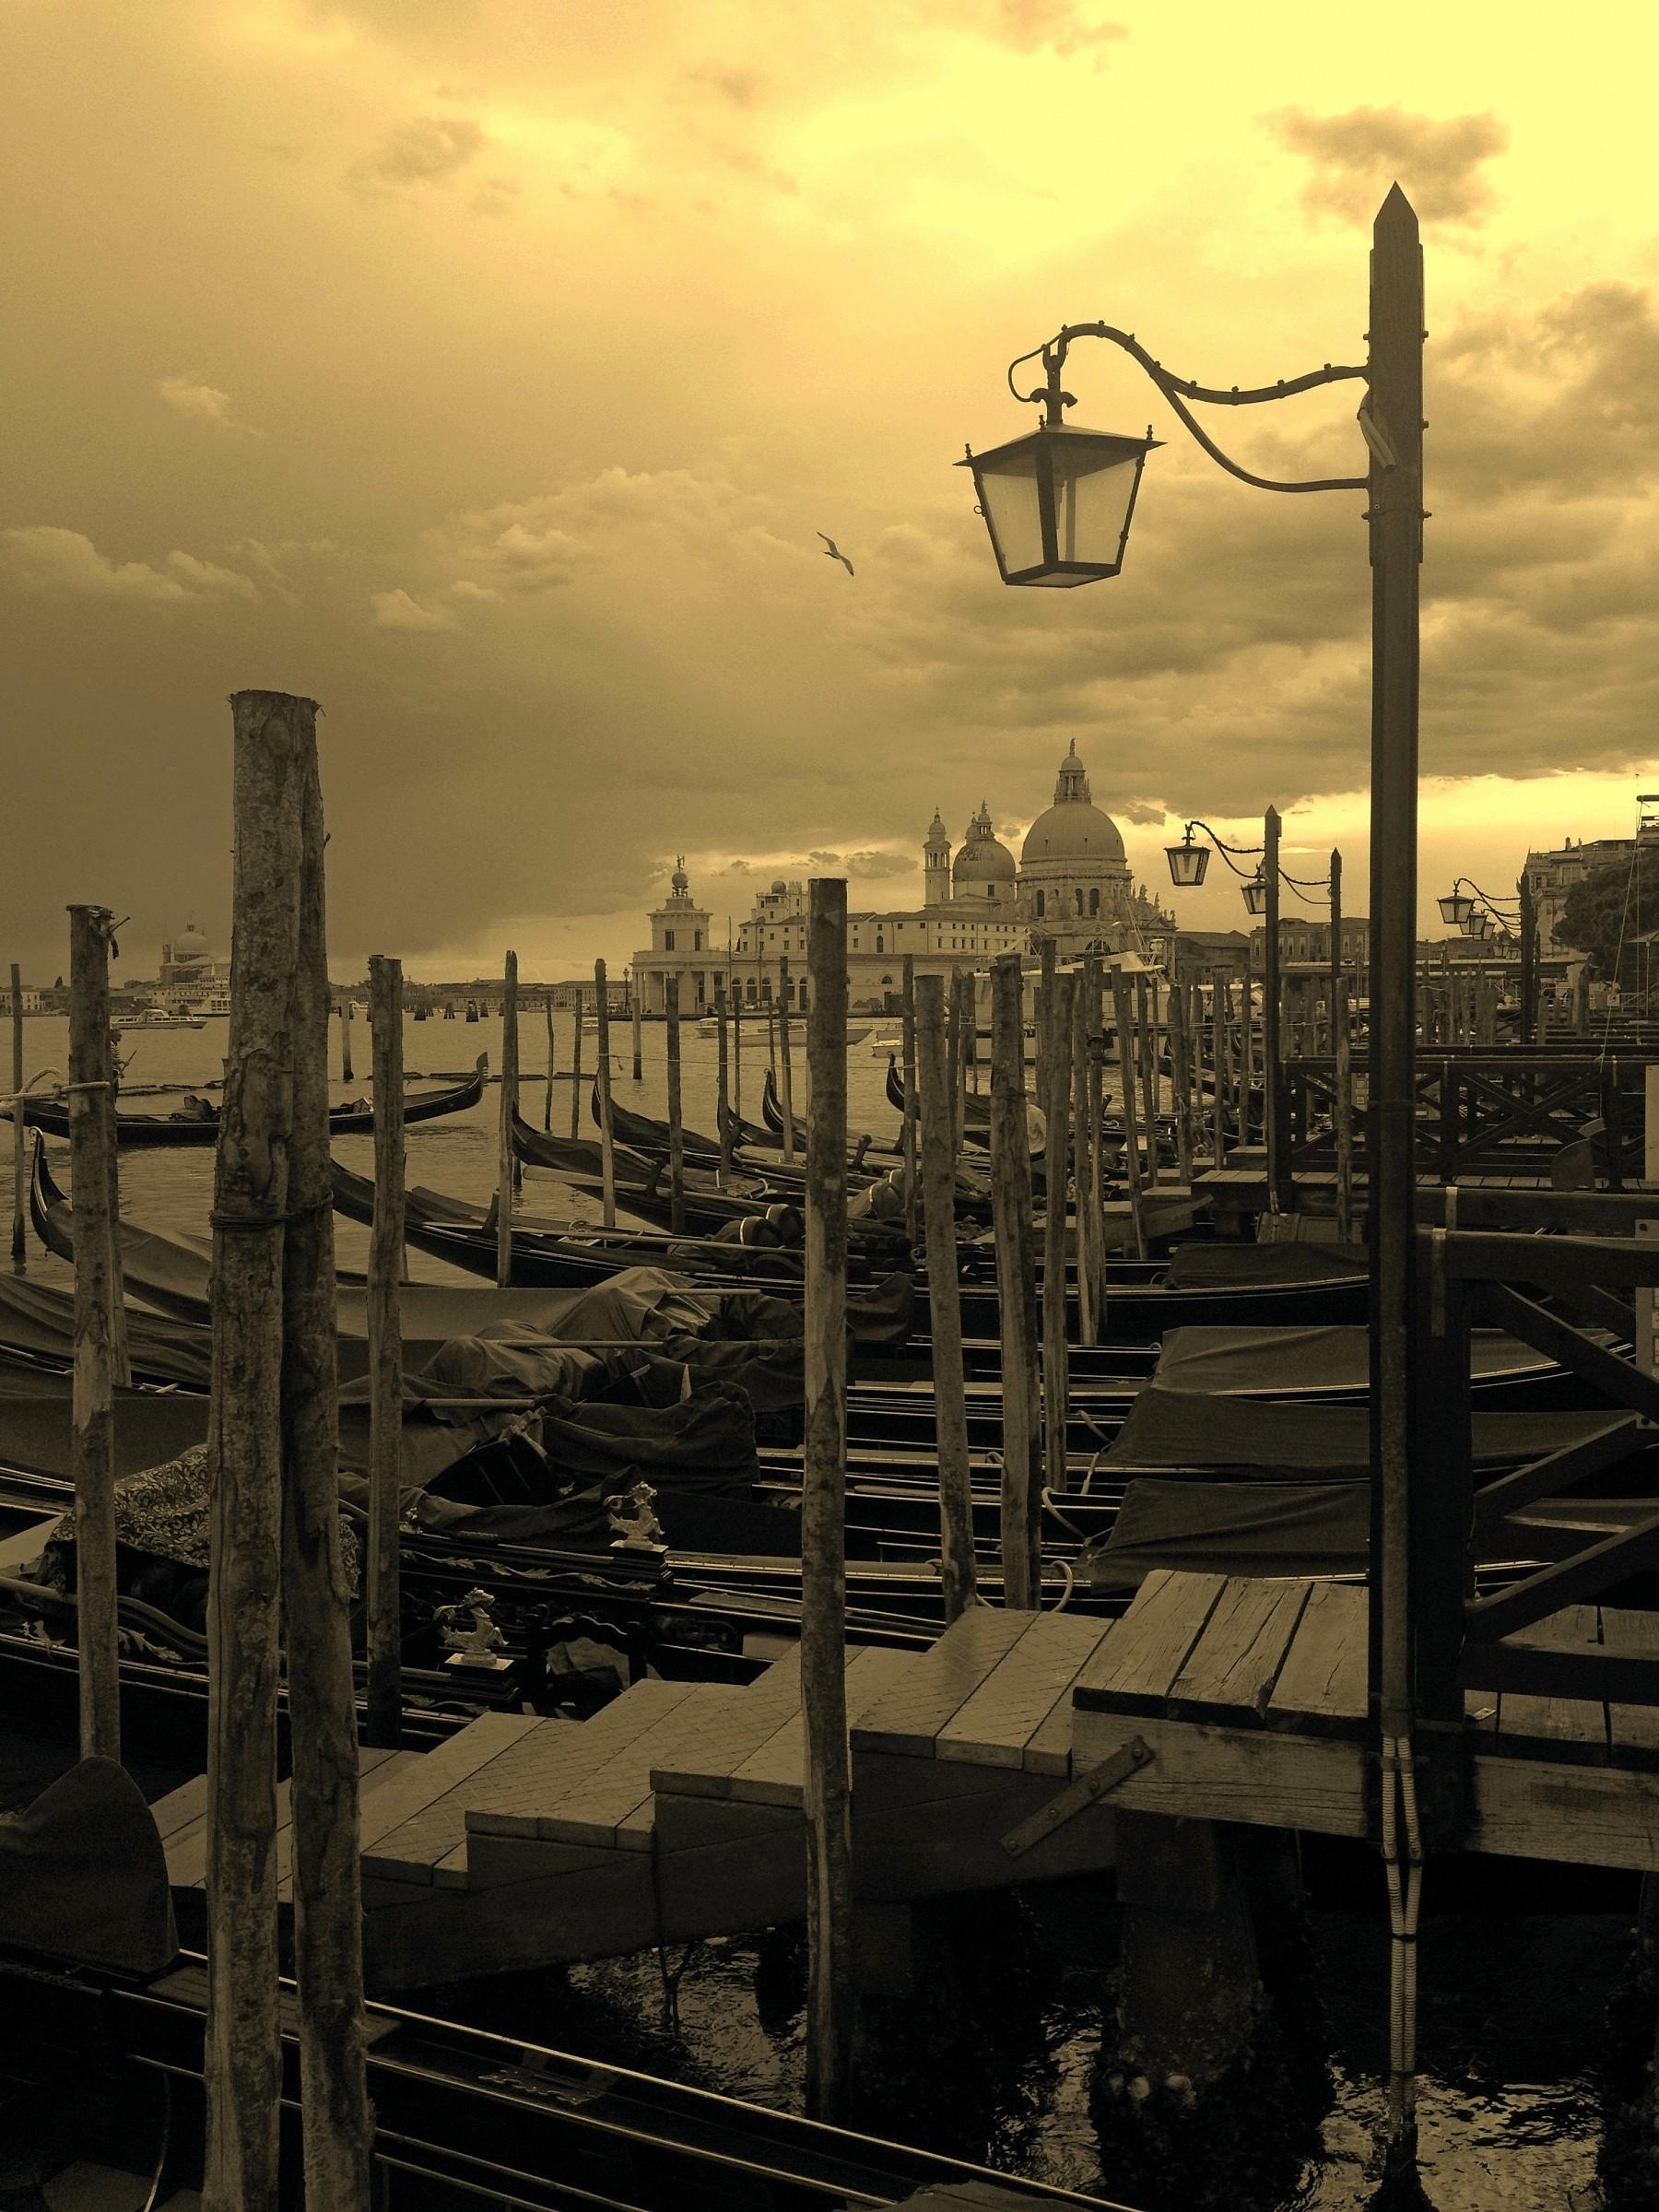 longing Venetian...